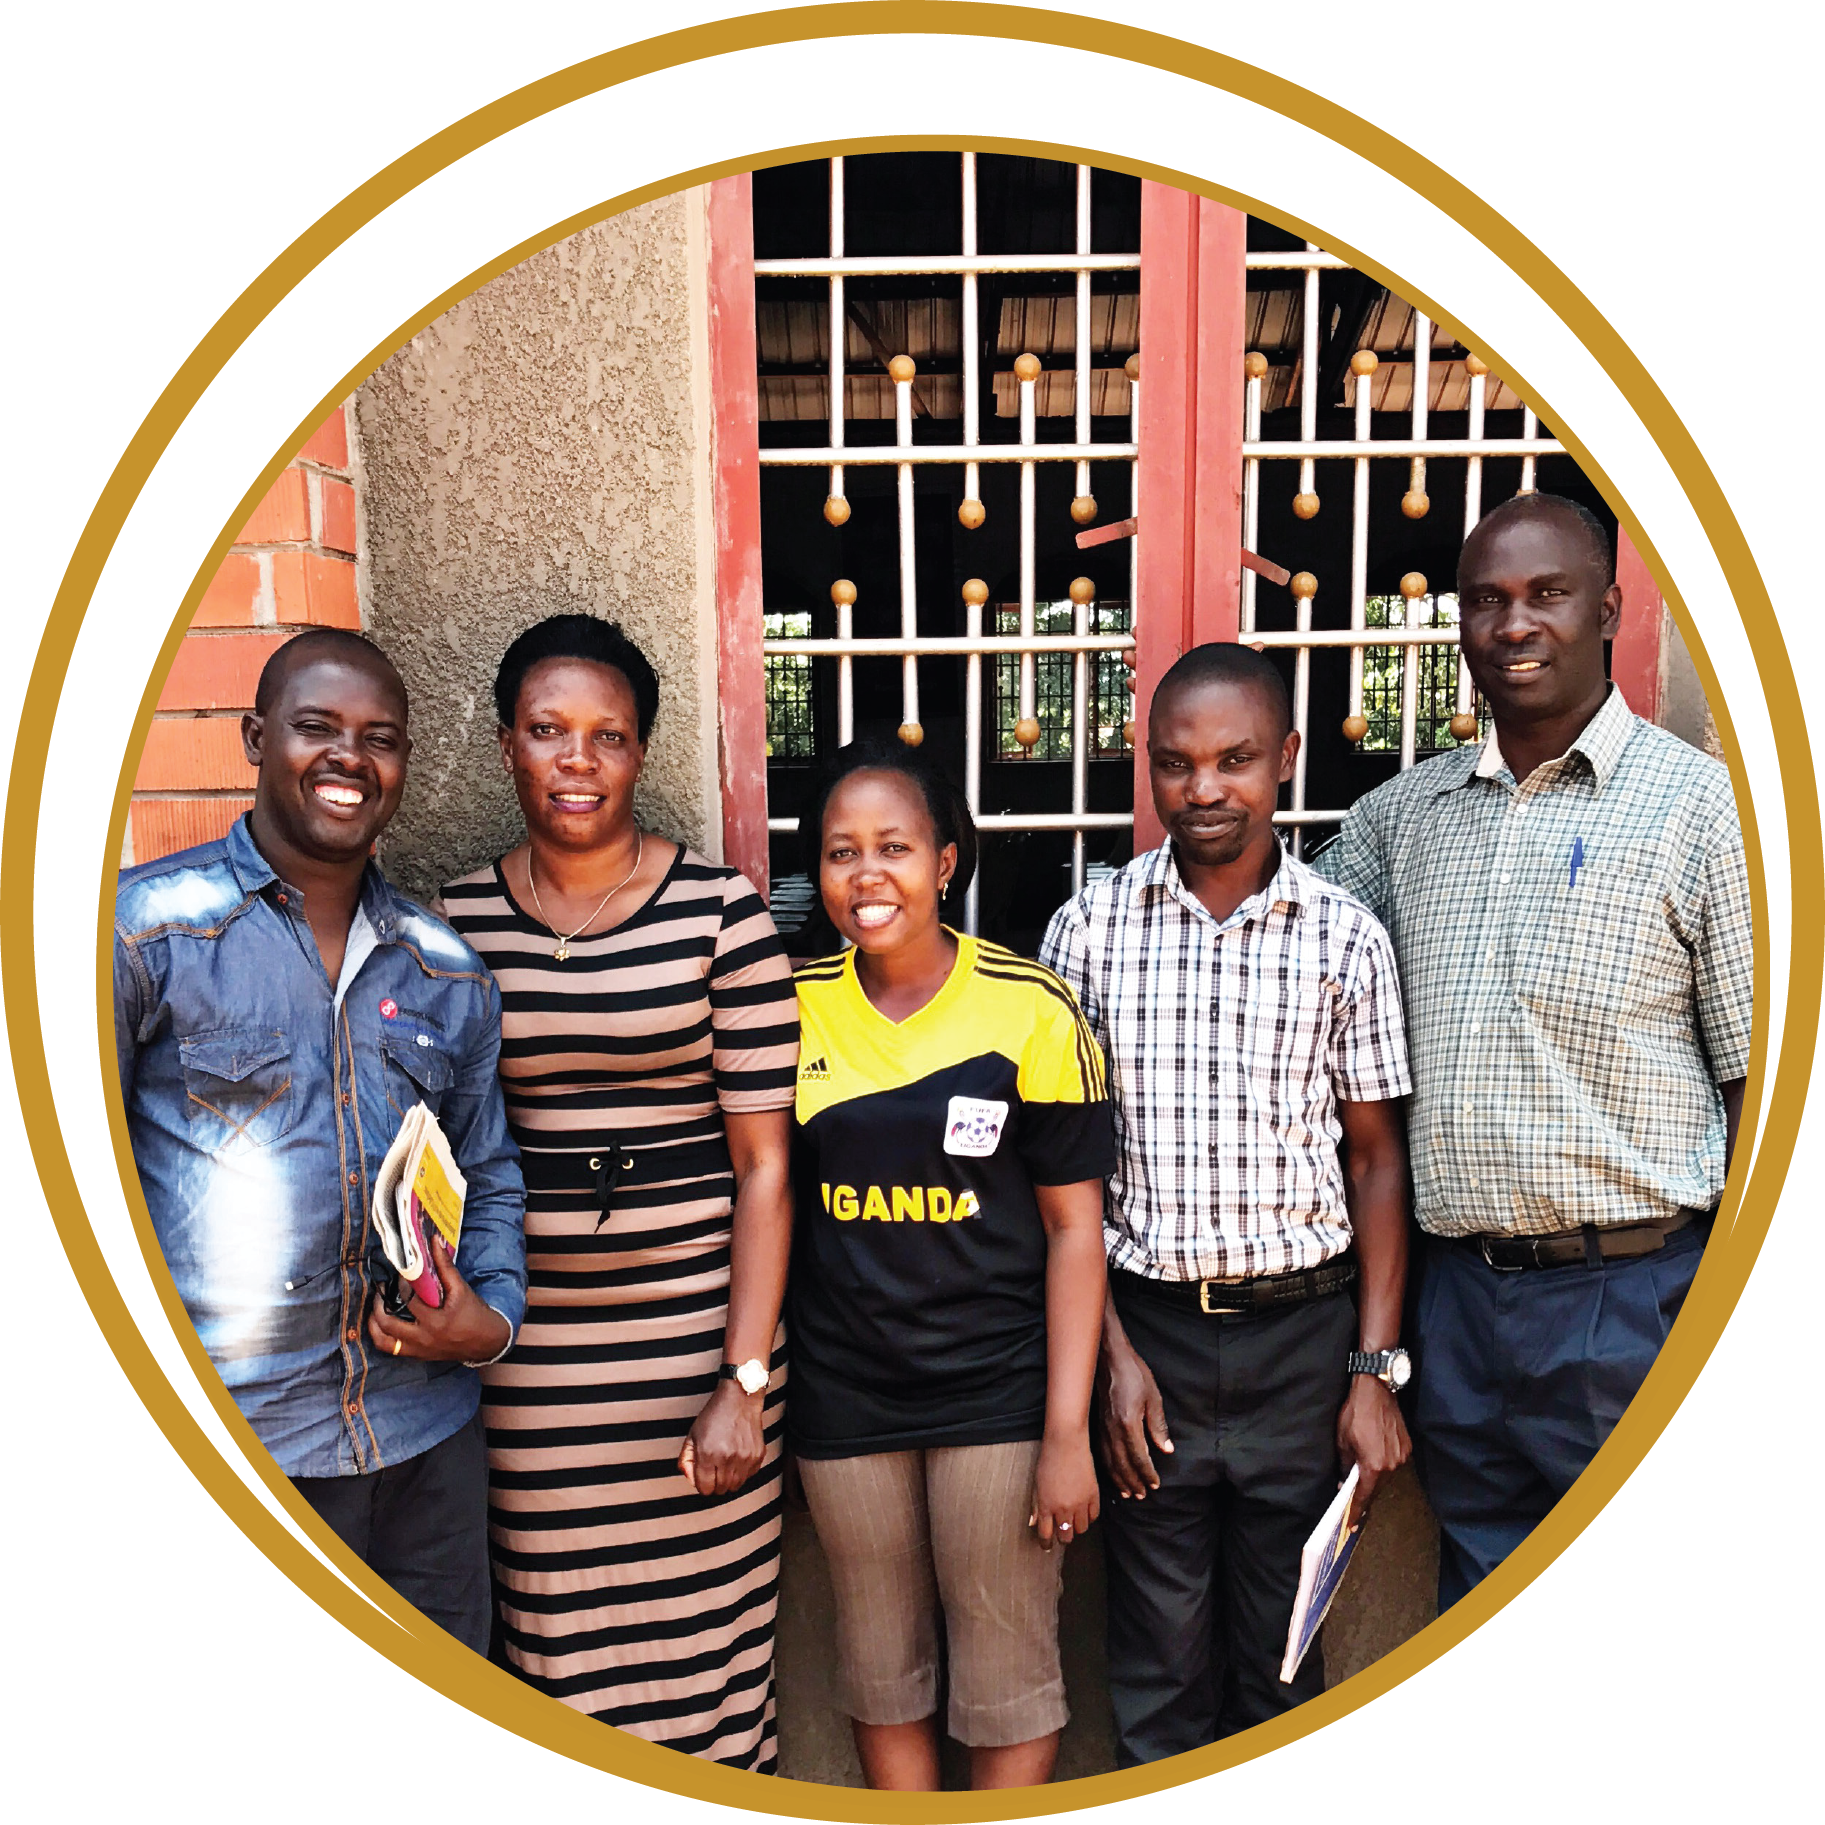 The Kkumi Project Uganda Team